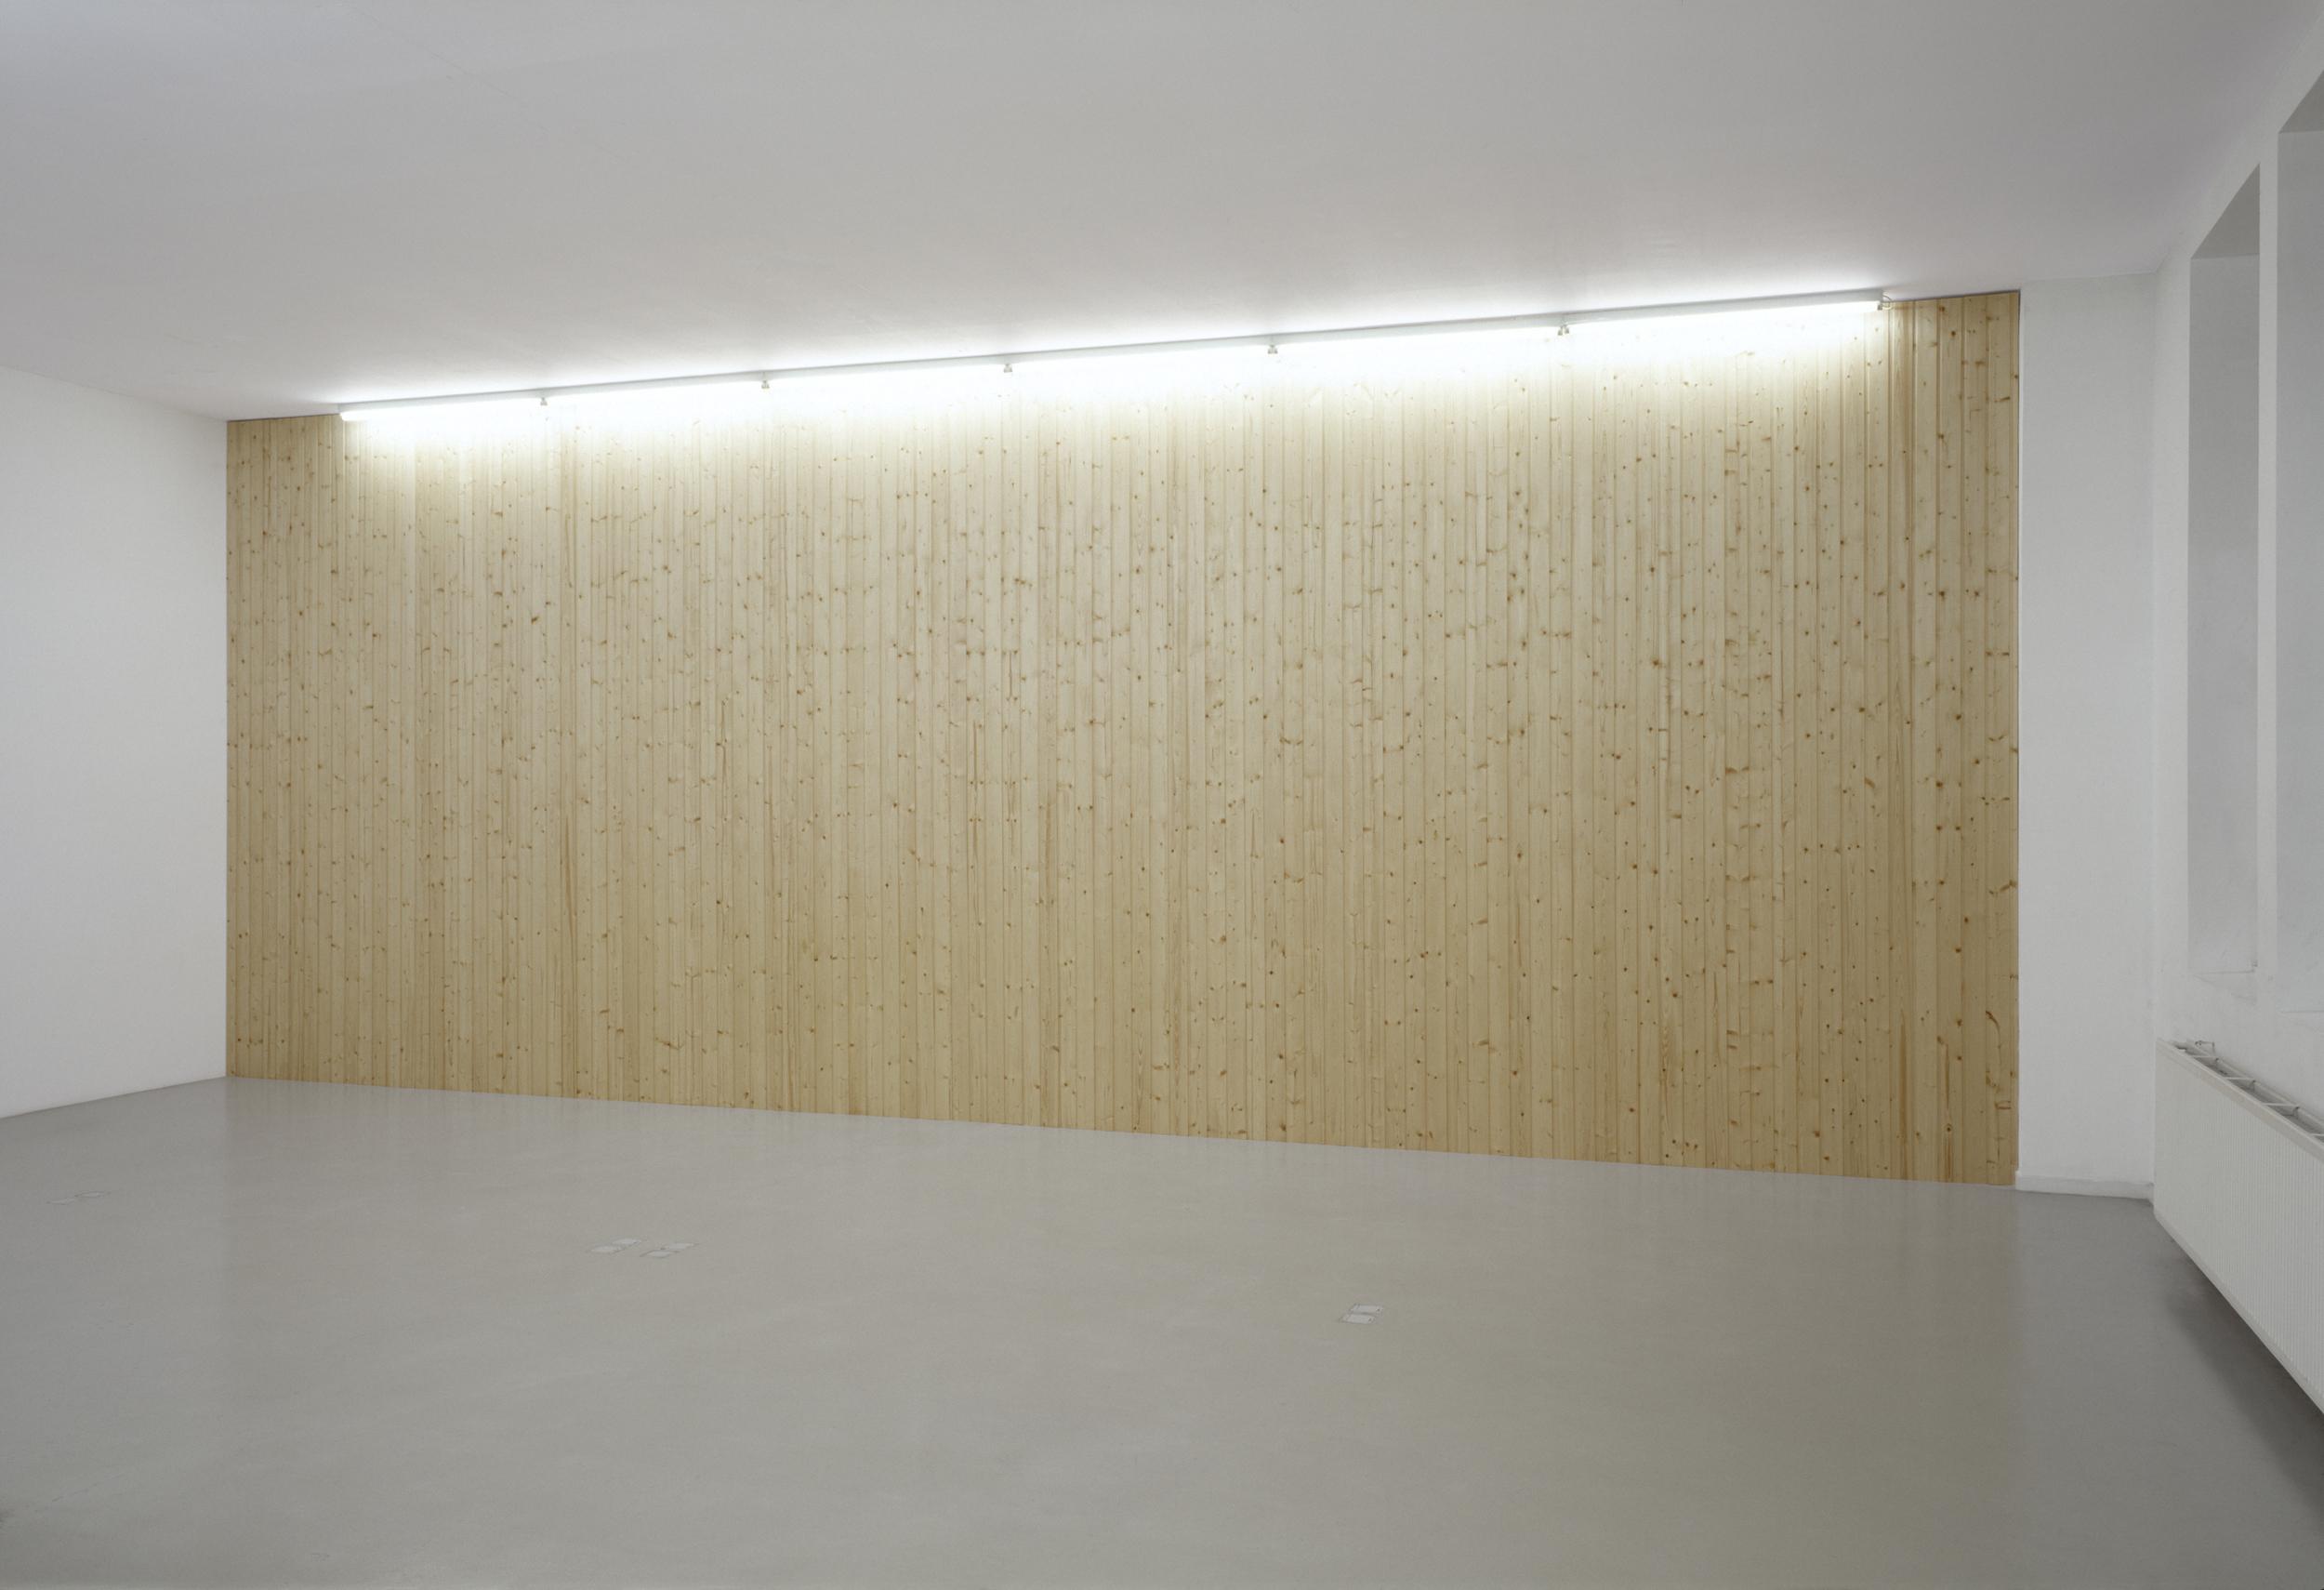 Untitled, 2002, wooden panels, 350 x 870 cm